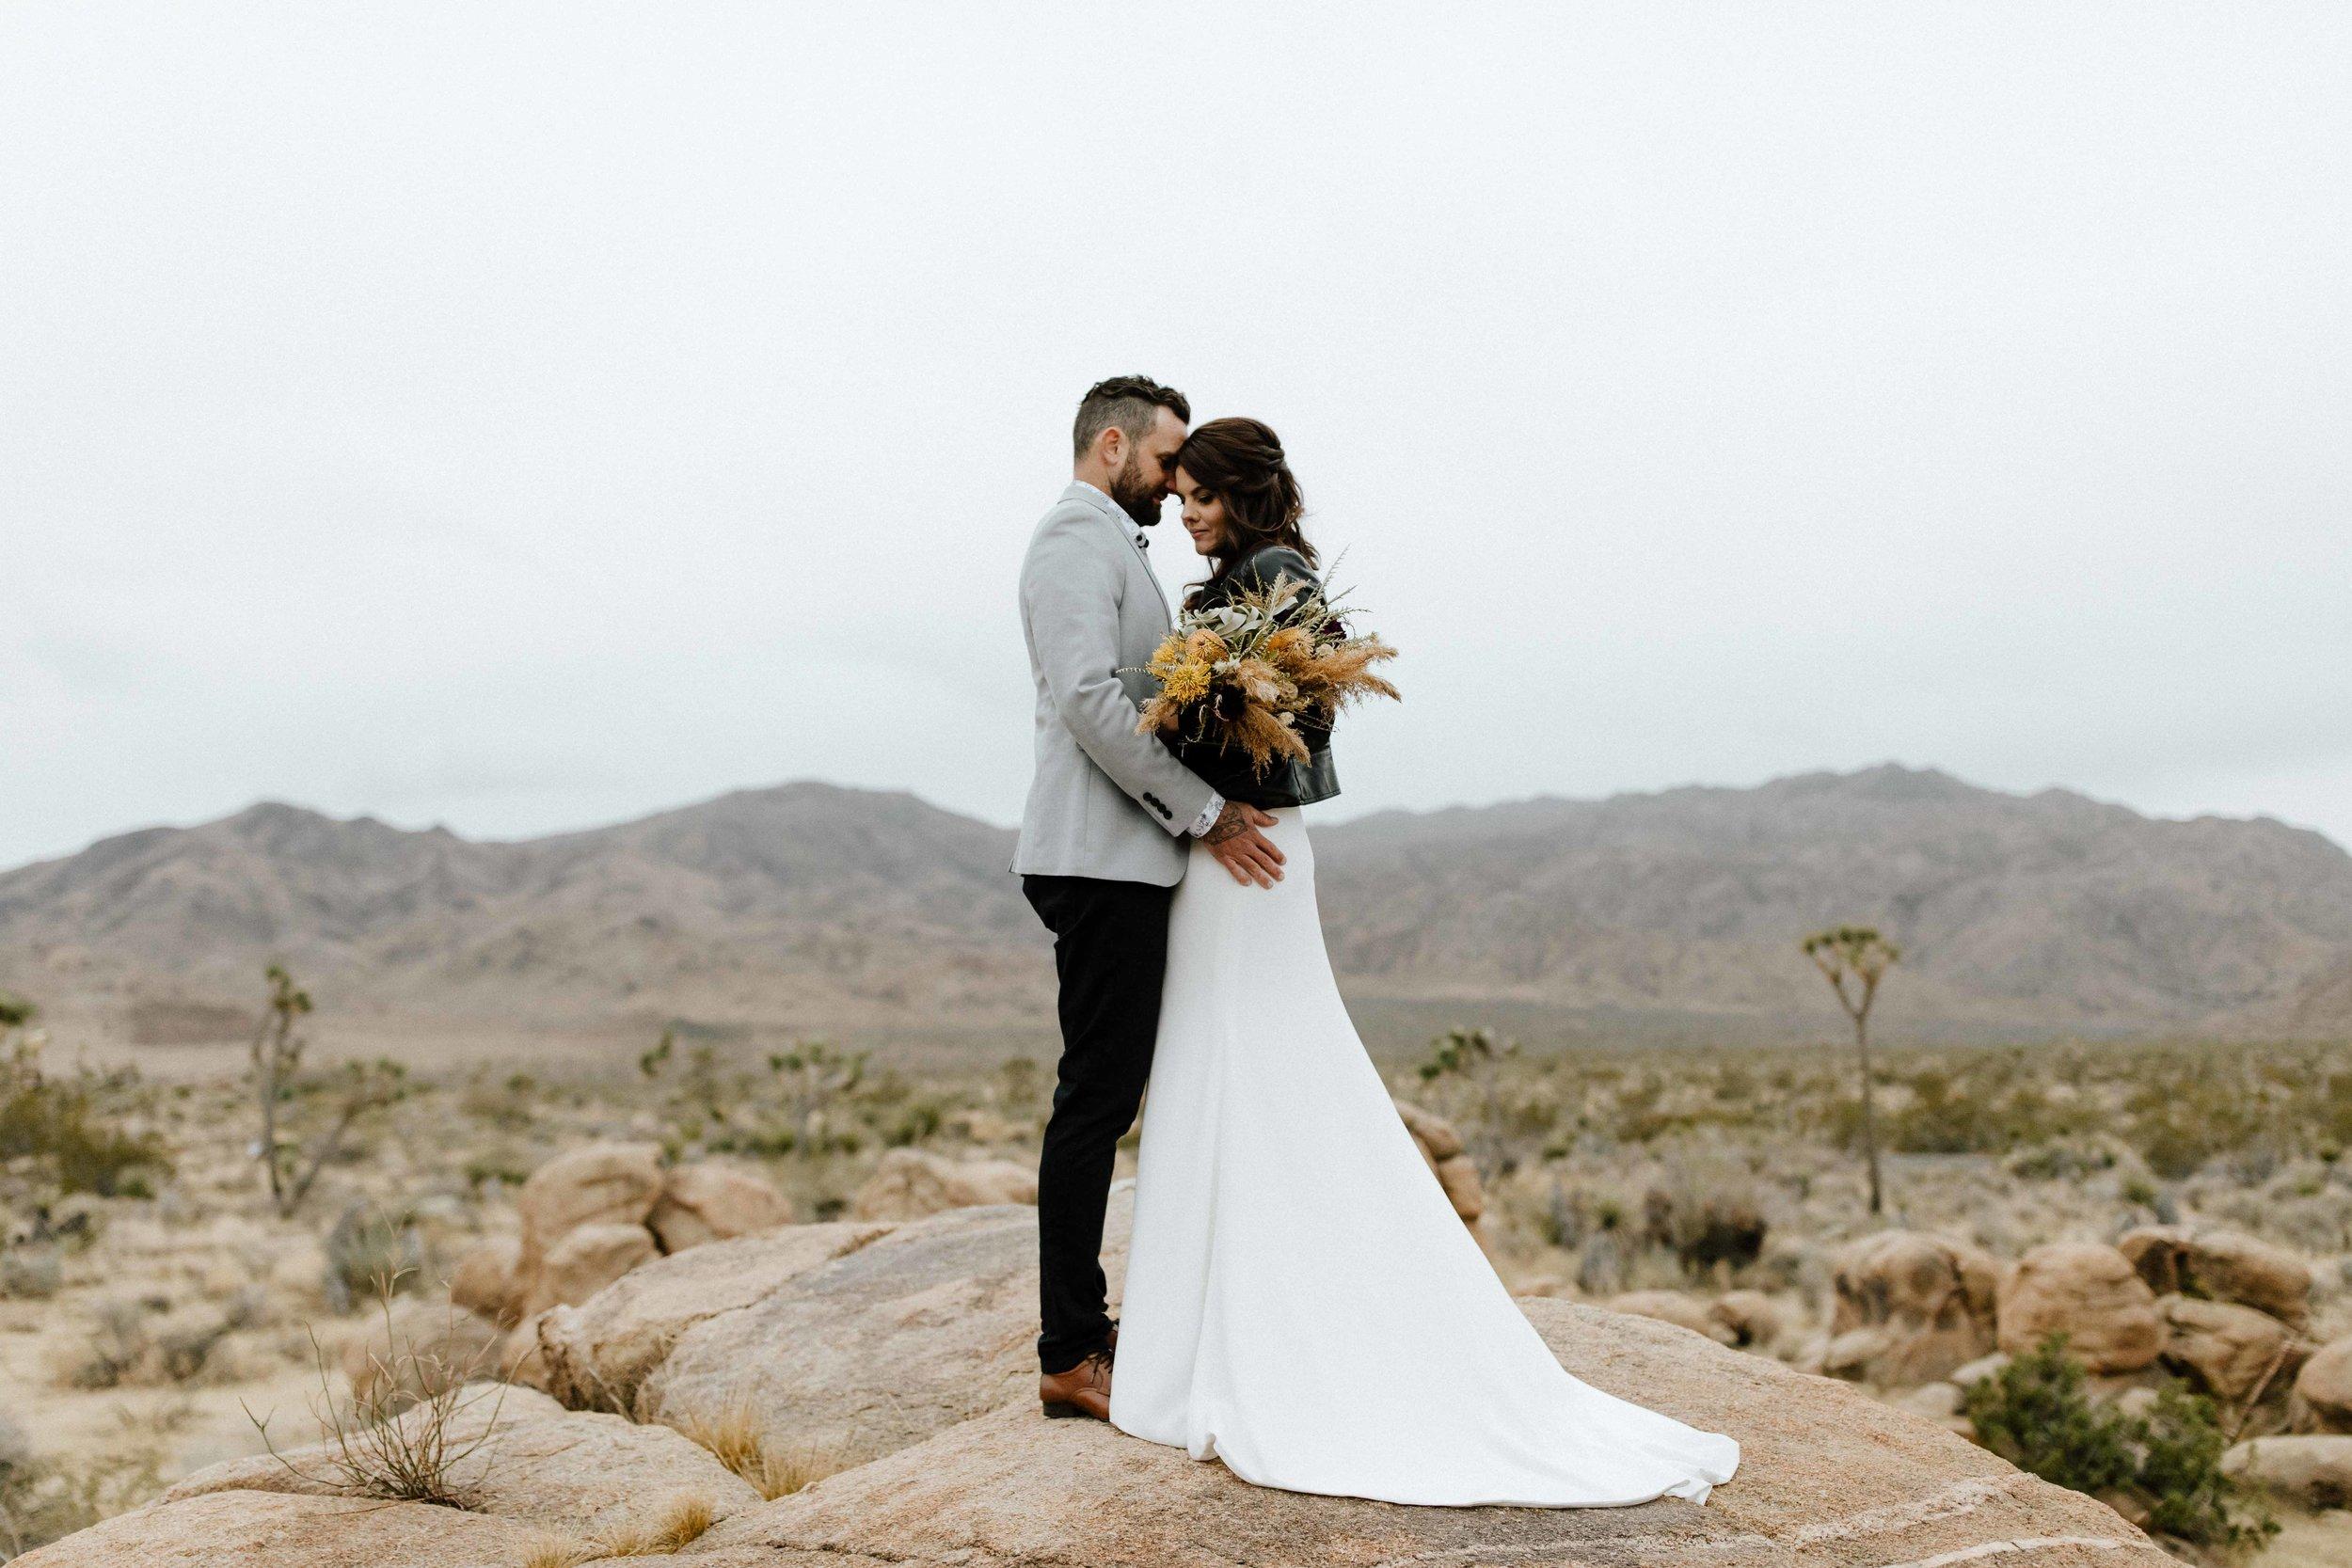 America Joshua Tree Palm Springs Elopement wedding-35.jpg